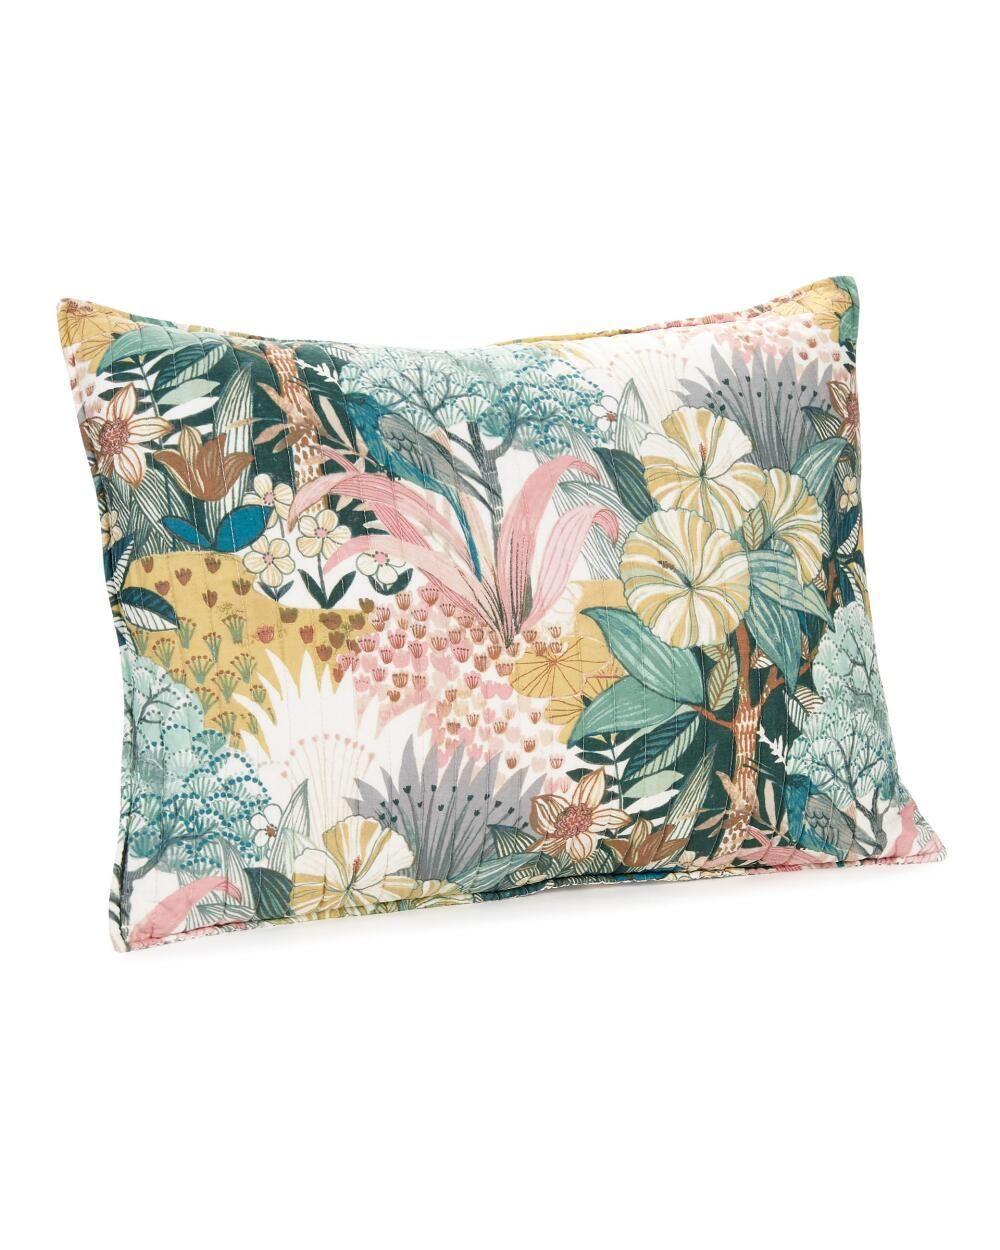 Arte Boema Ashika Luxury Sham Standard Sham Polyester Cotton Rayon In 2020 Sham Stein Mart Monochrome Prints